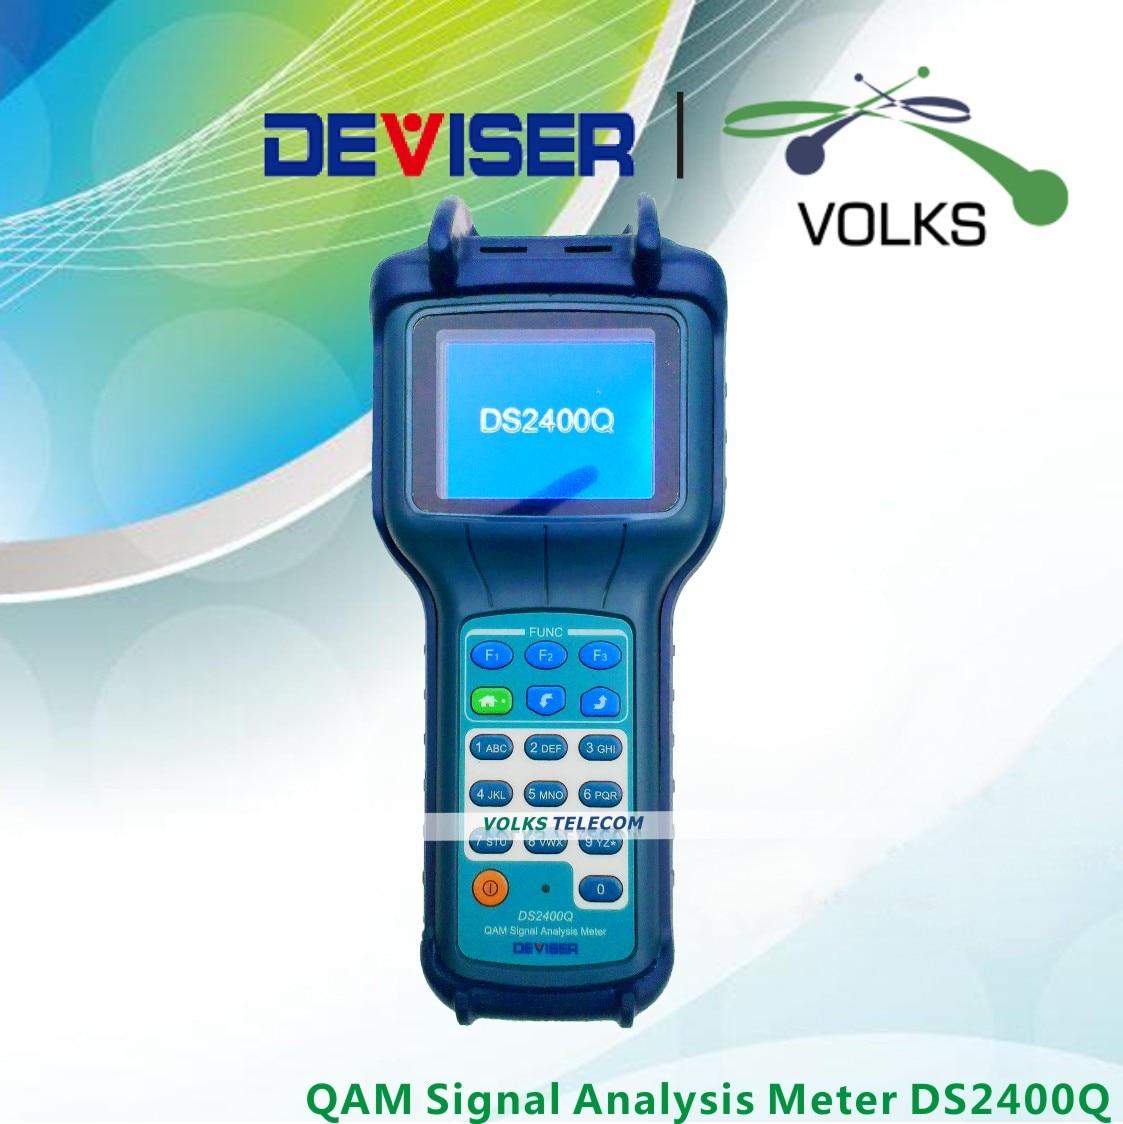 QAM Signal Analysis Meter Original Deviser DS2400Q free ...